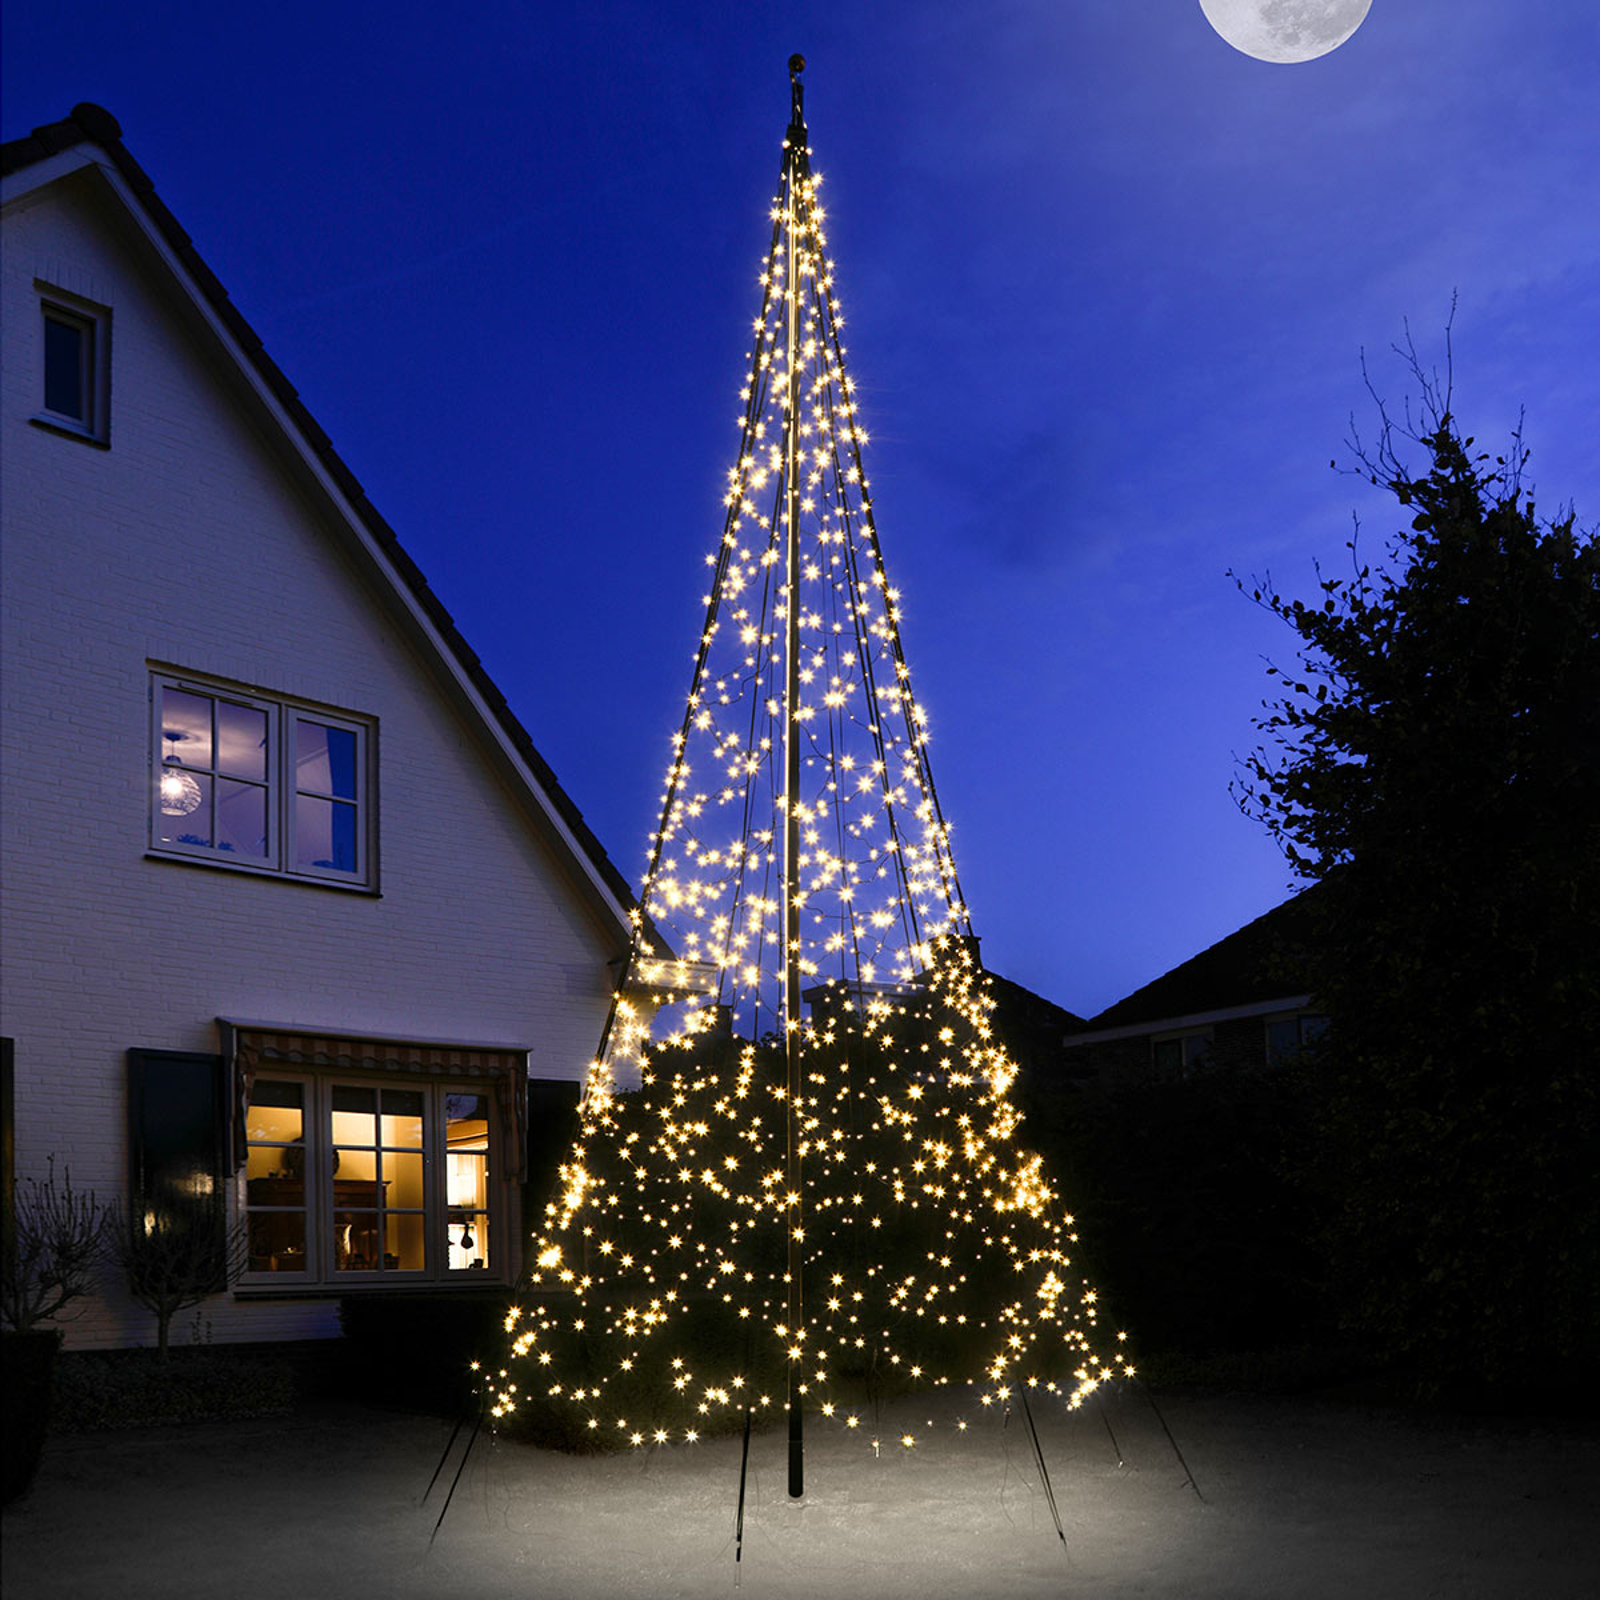 Fairybell® Weihnachtsbaum, 6 m, 1200 LEDs blinkend